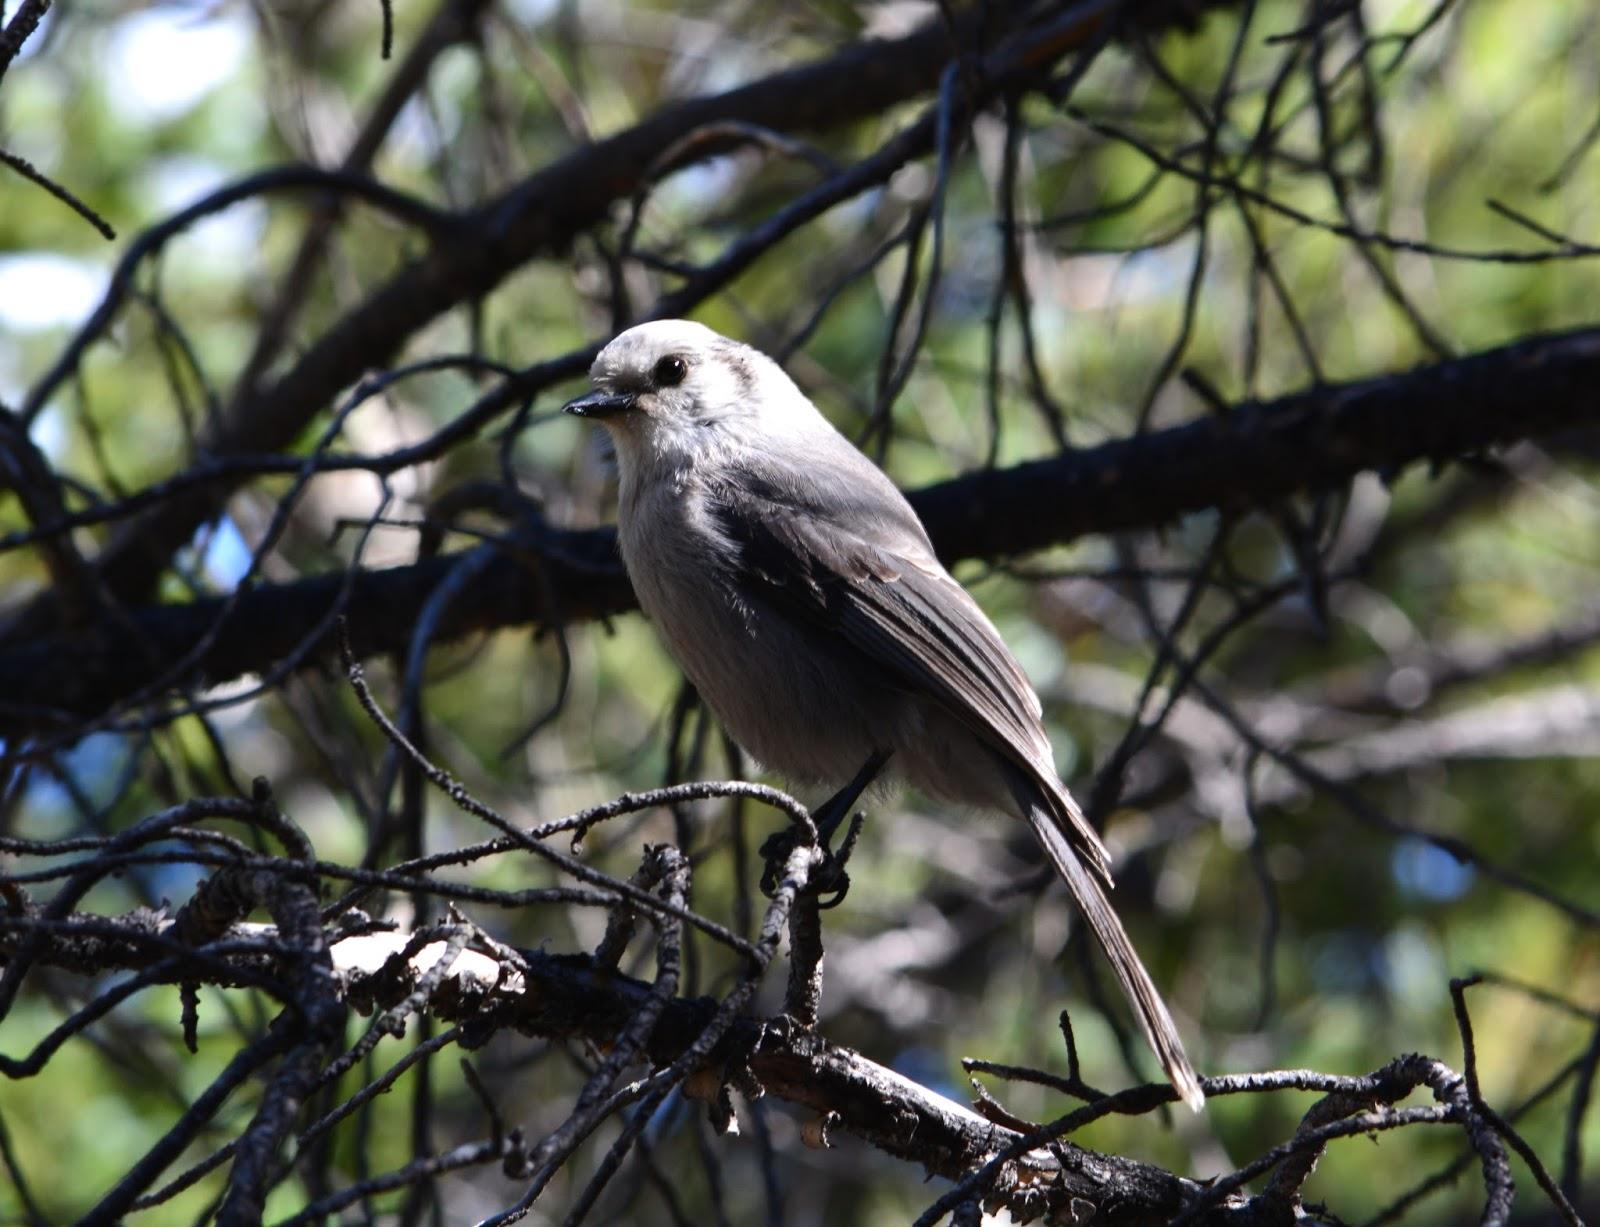 cozy birdhouse | gray jay at rocky mountain national park